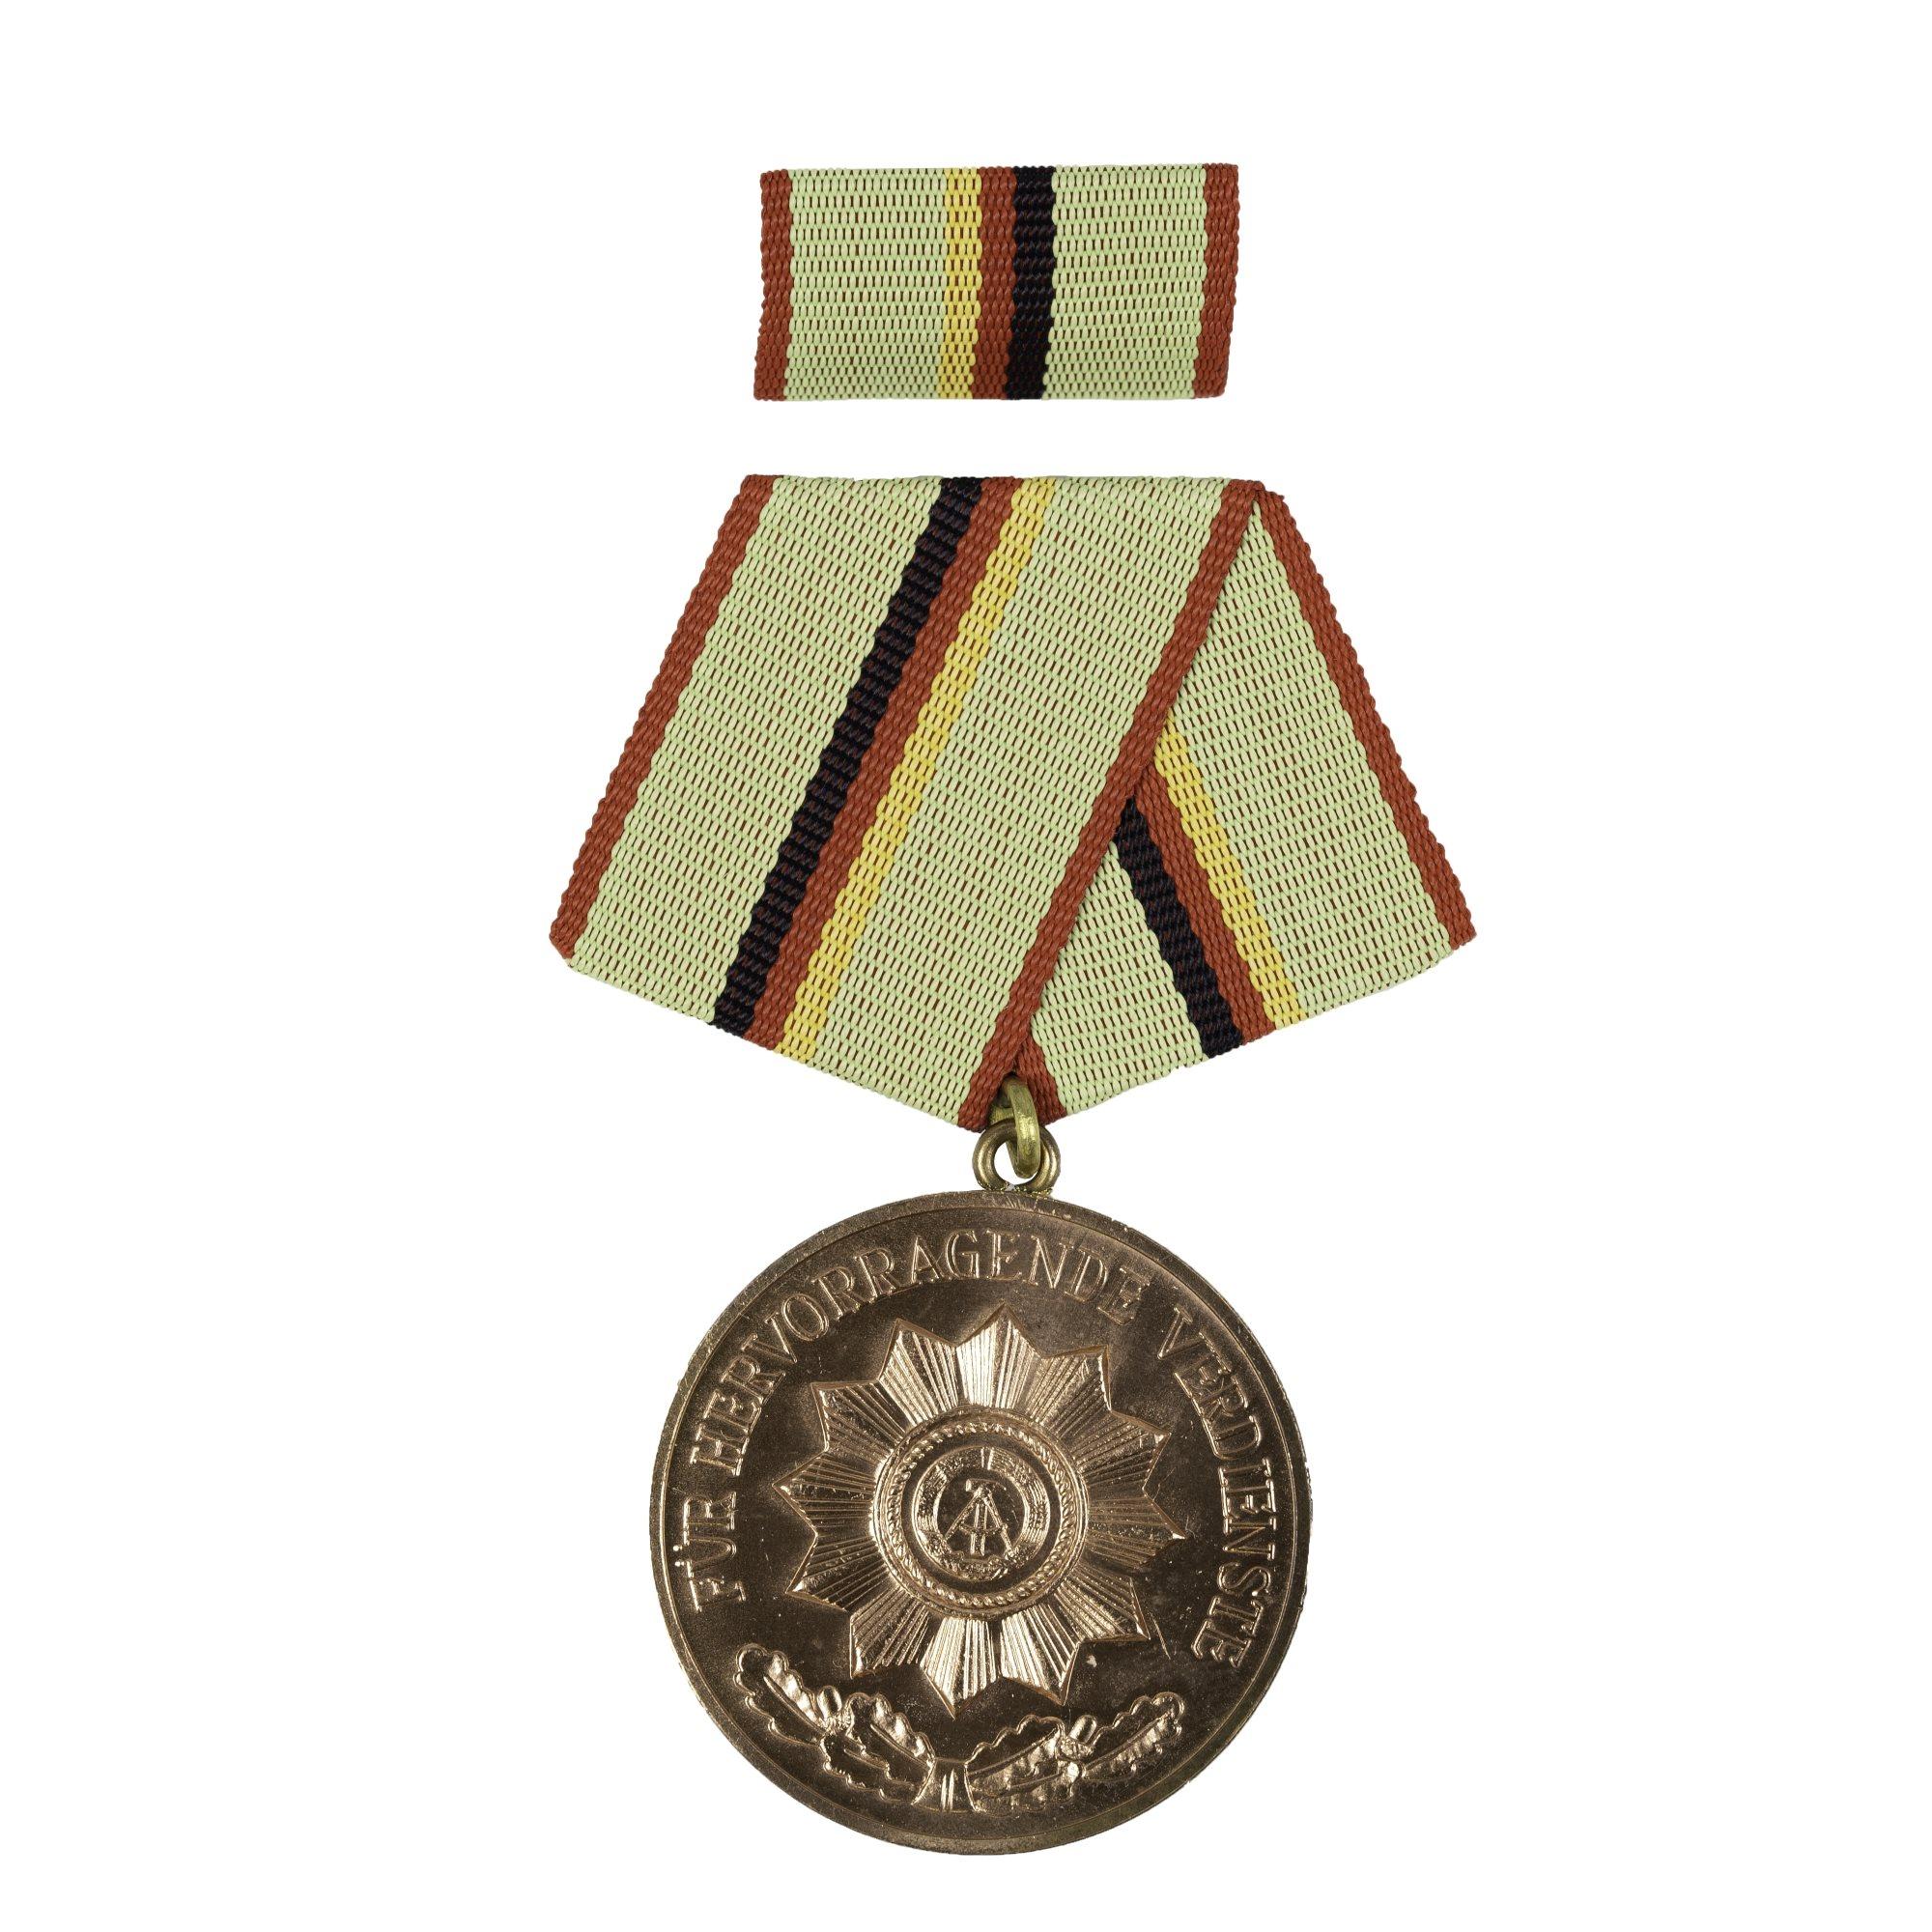 Medaile vyznamenání MDI VERDIENSTMEDAILLE BRONZ